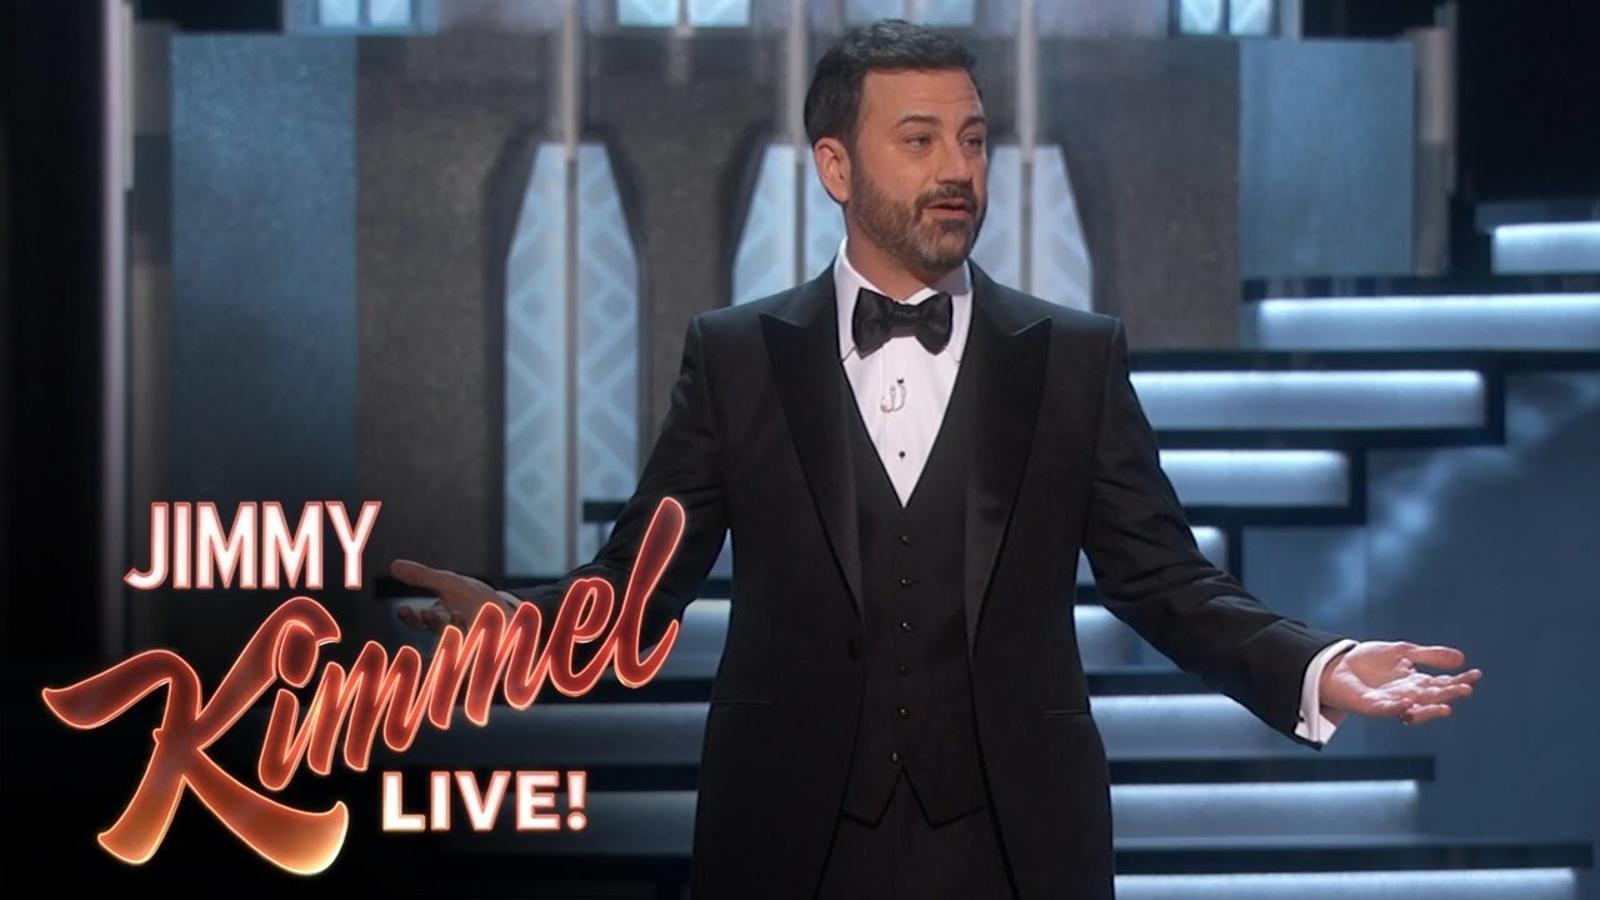 Monòleg inicial de Jimmy Kimmel als Oscars 2017